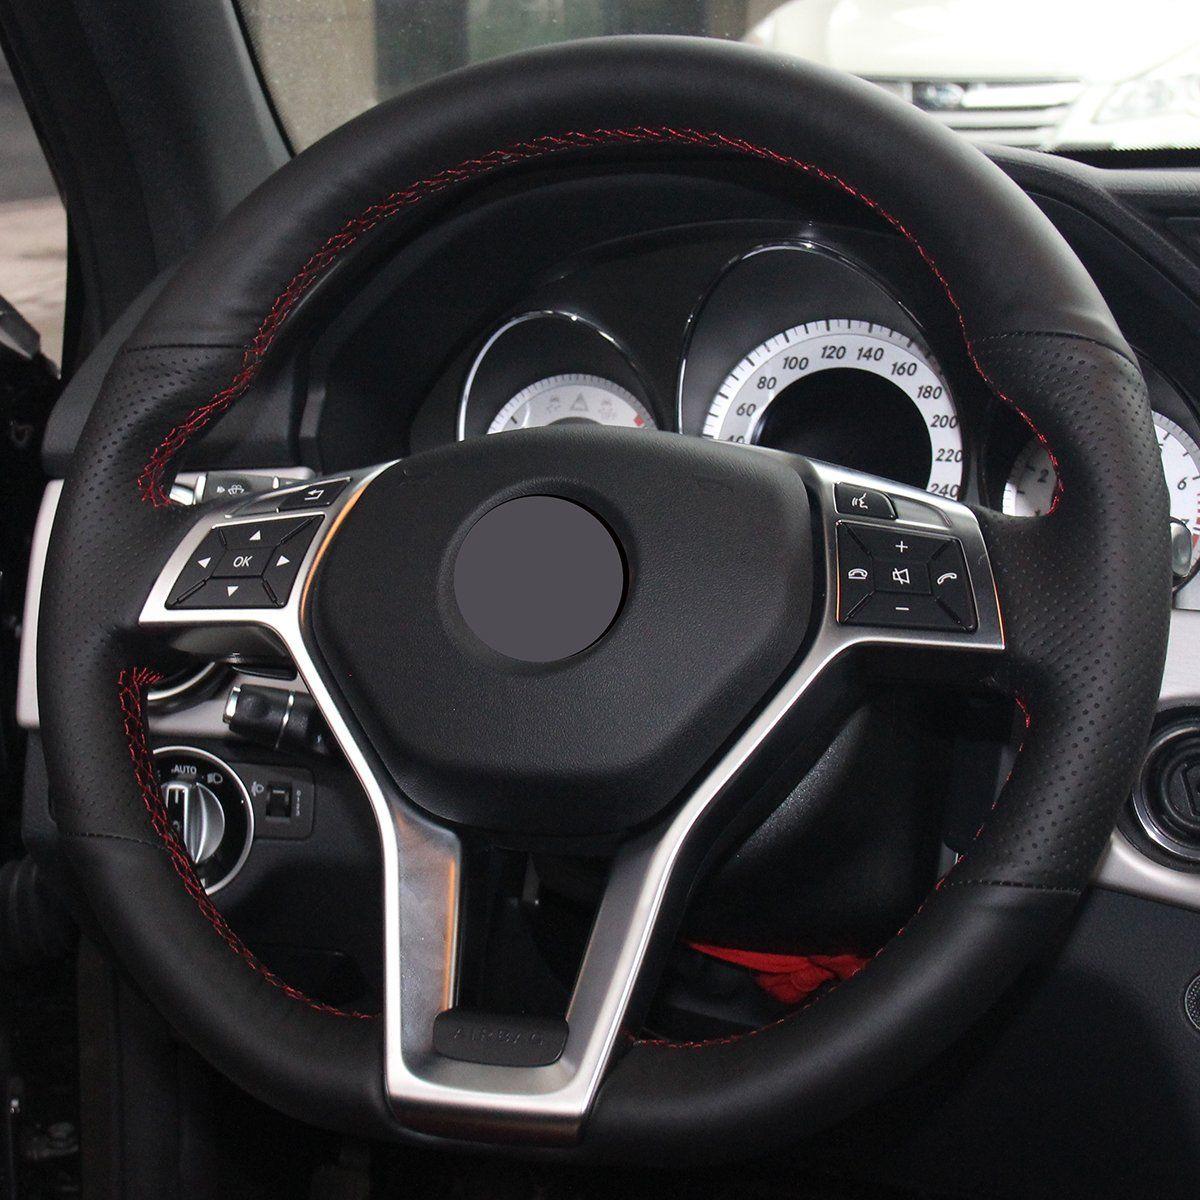 Fremont Die Oakland Raiders NFL Leather Steering Wheel Cover